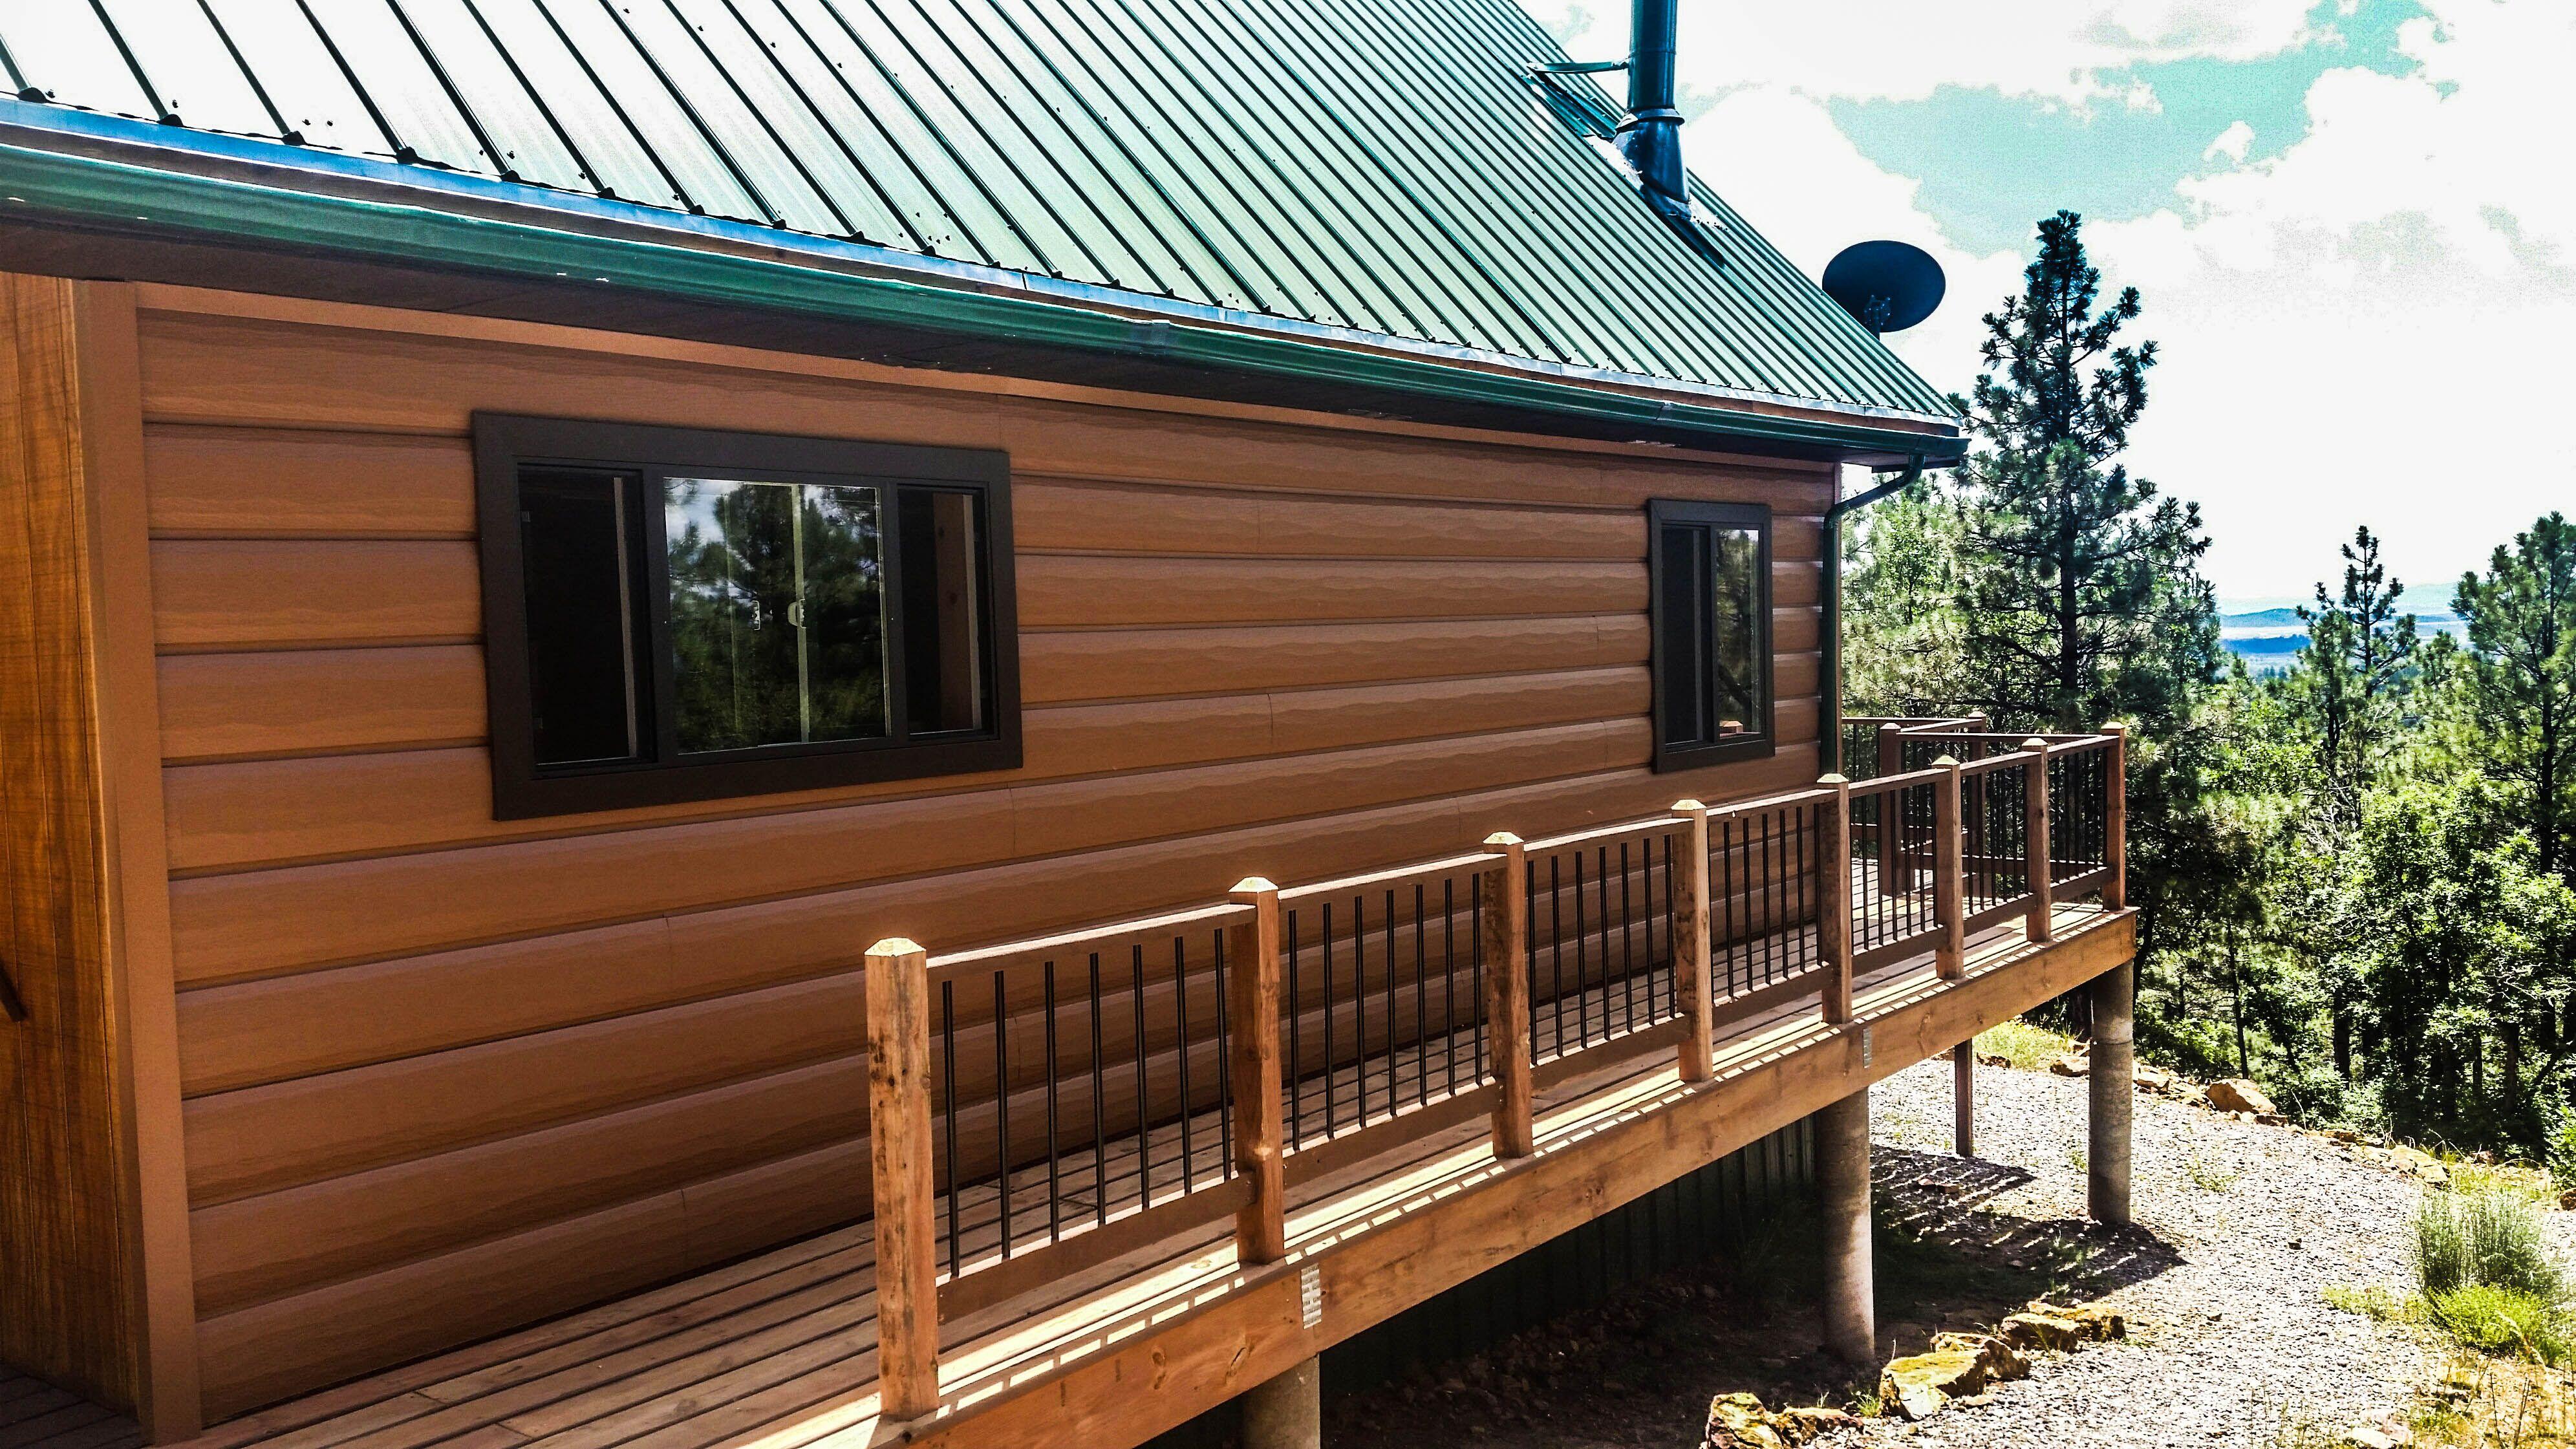 3x8 log siding hand hewn pine - Green Metal Roof With Cedar Log Siding